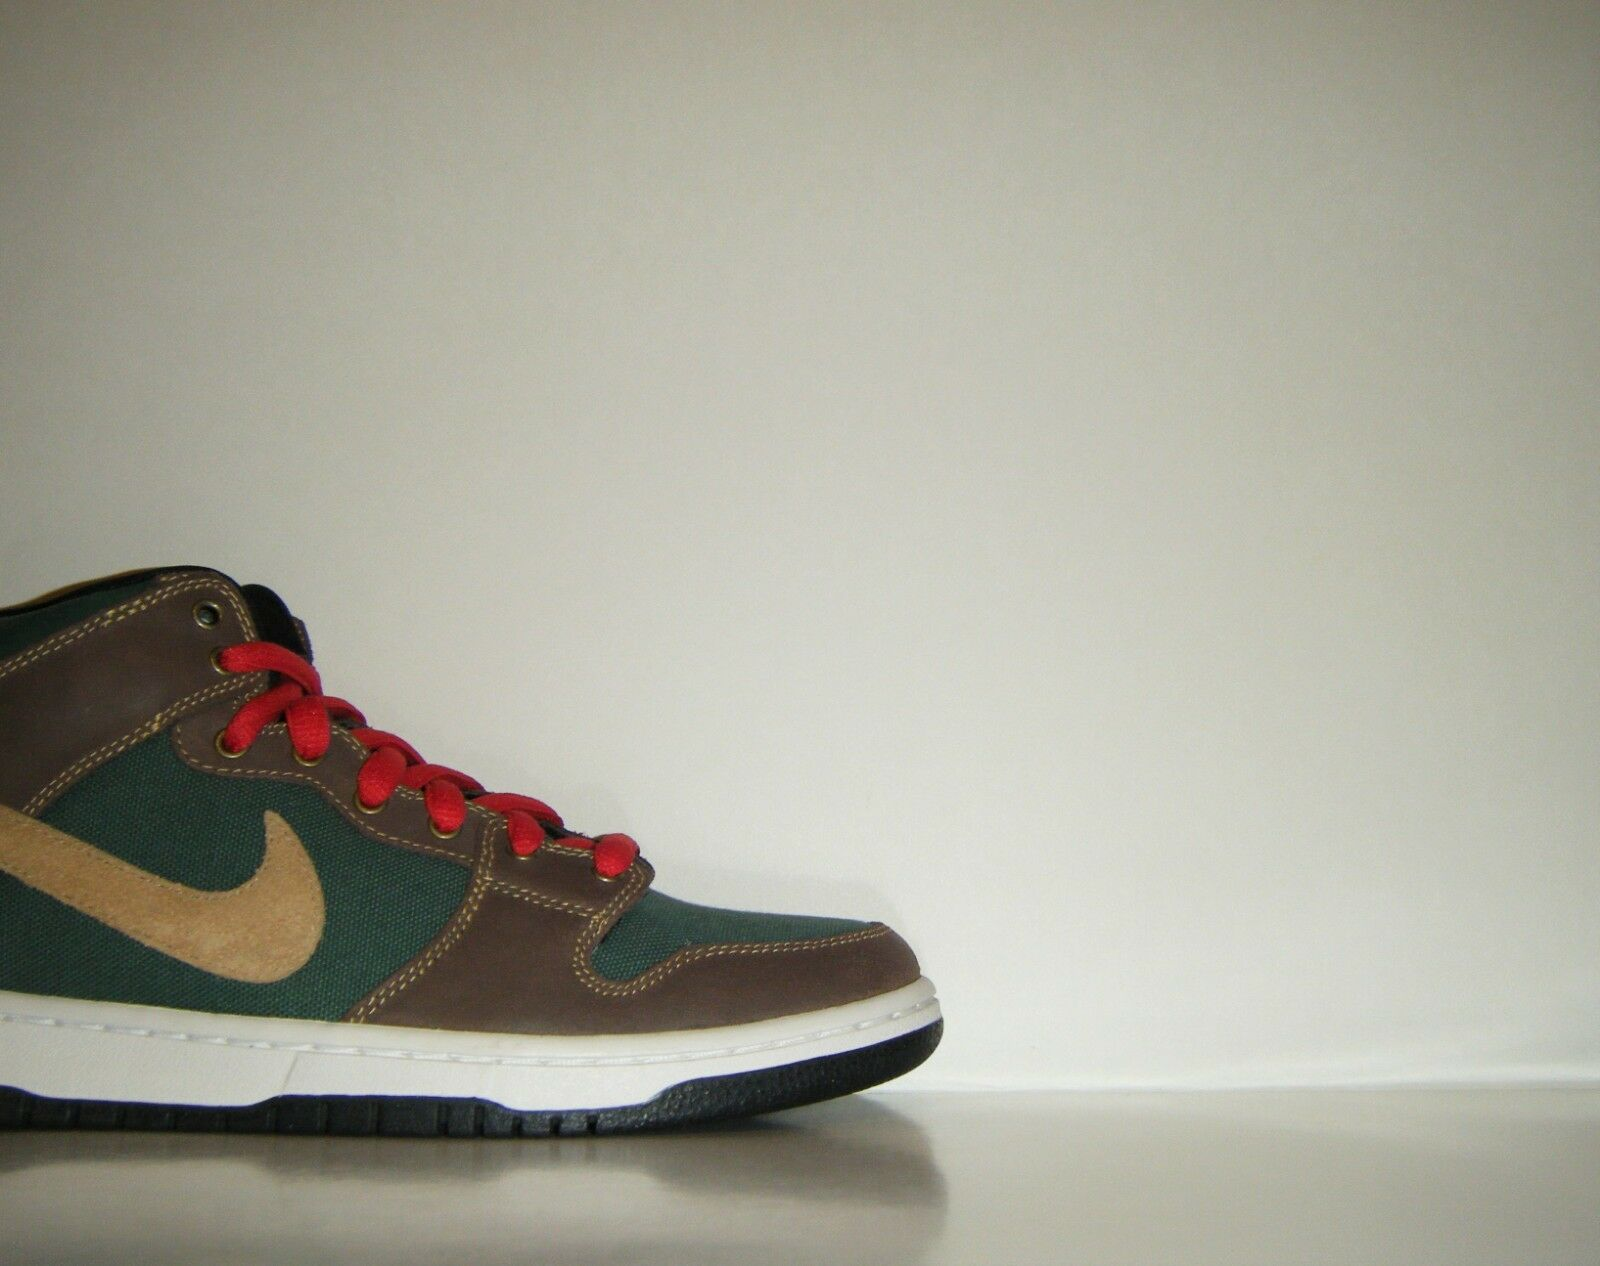 2011 Nike Dunk Mid Pro SB PATAGONIA Green Brown Boot Sample Sz 9 High 314383-302